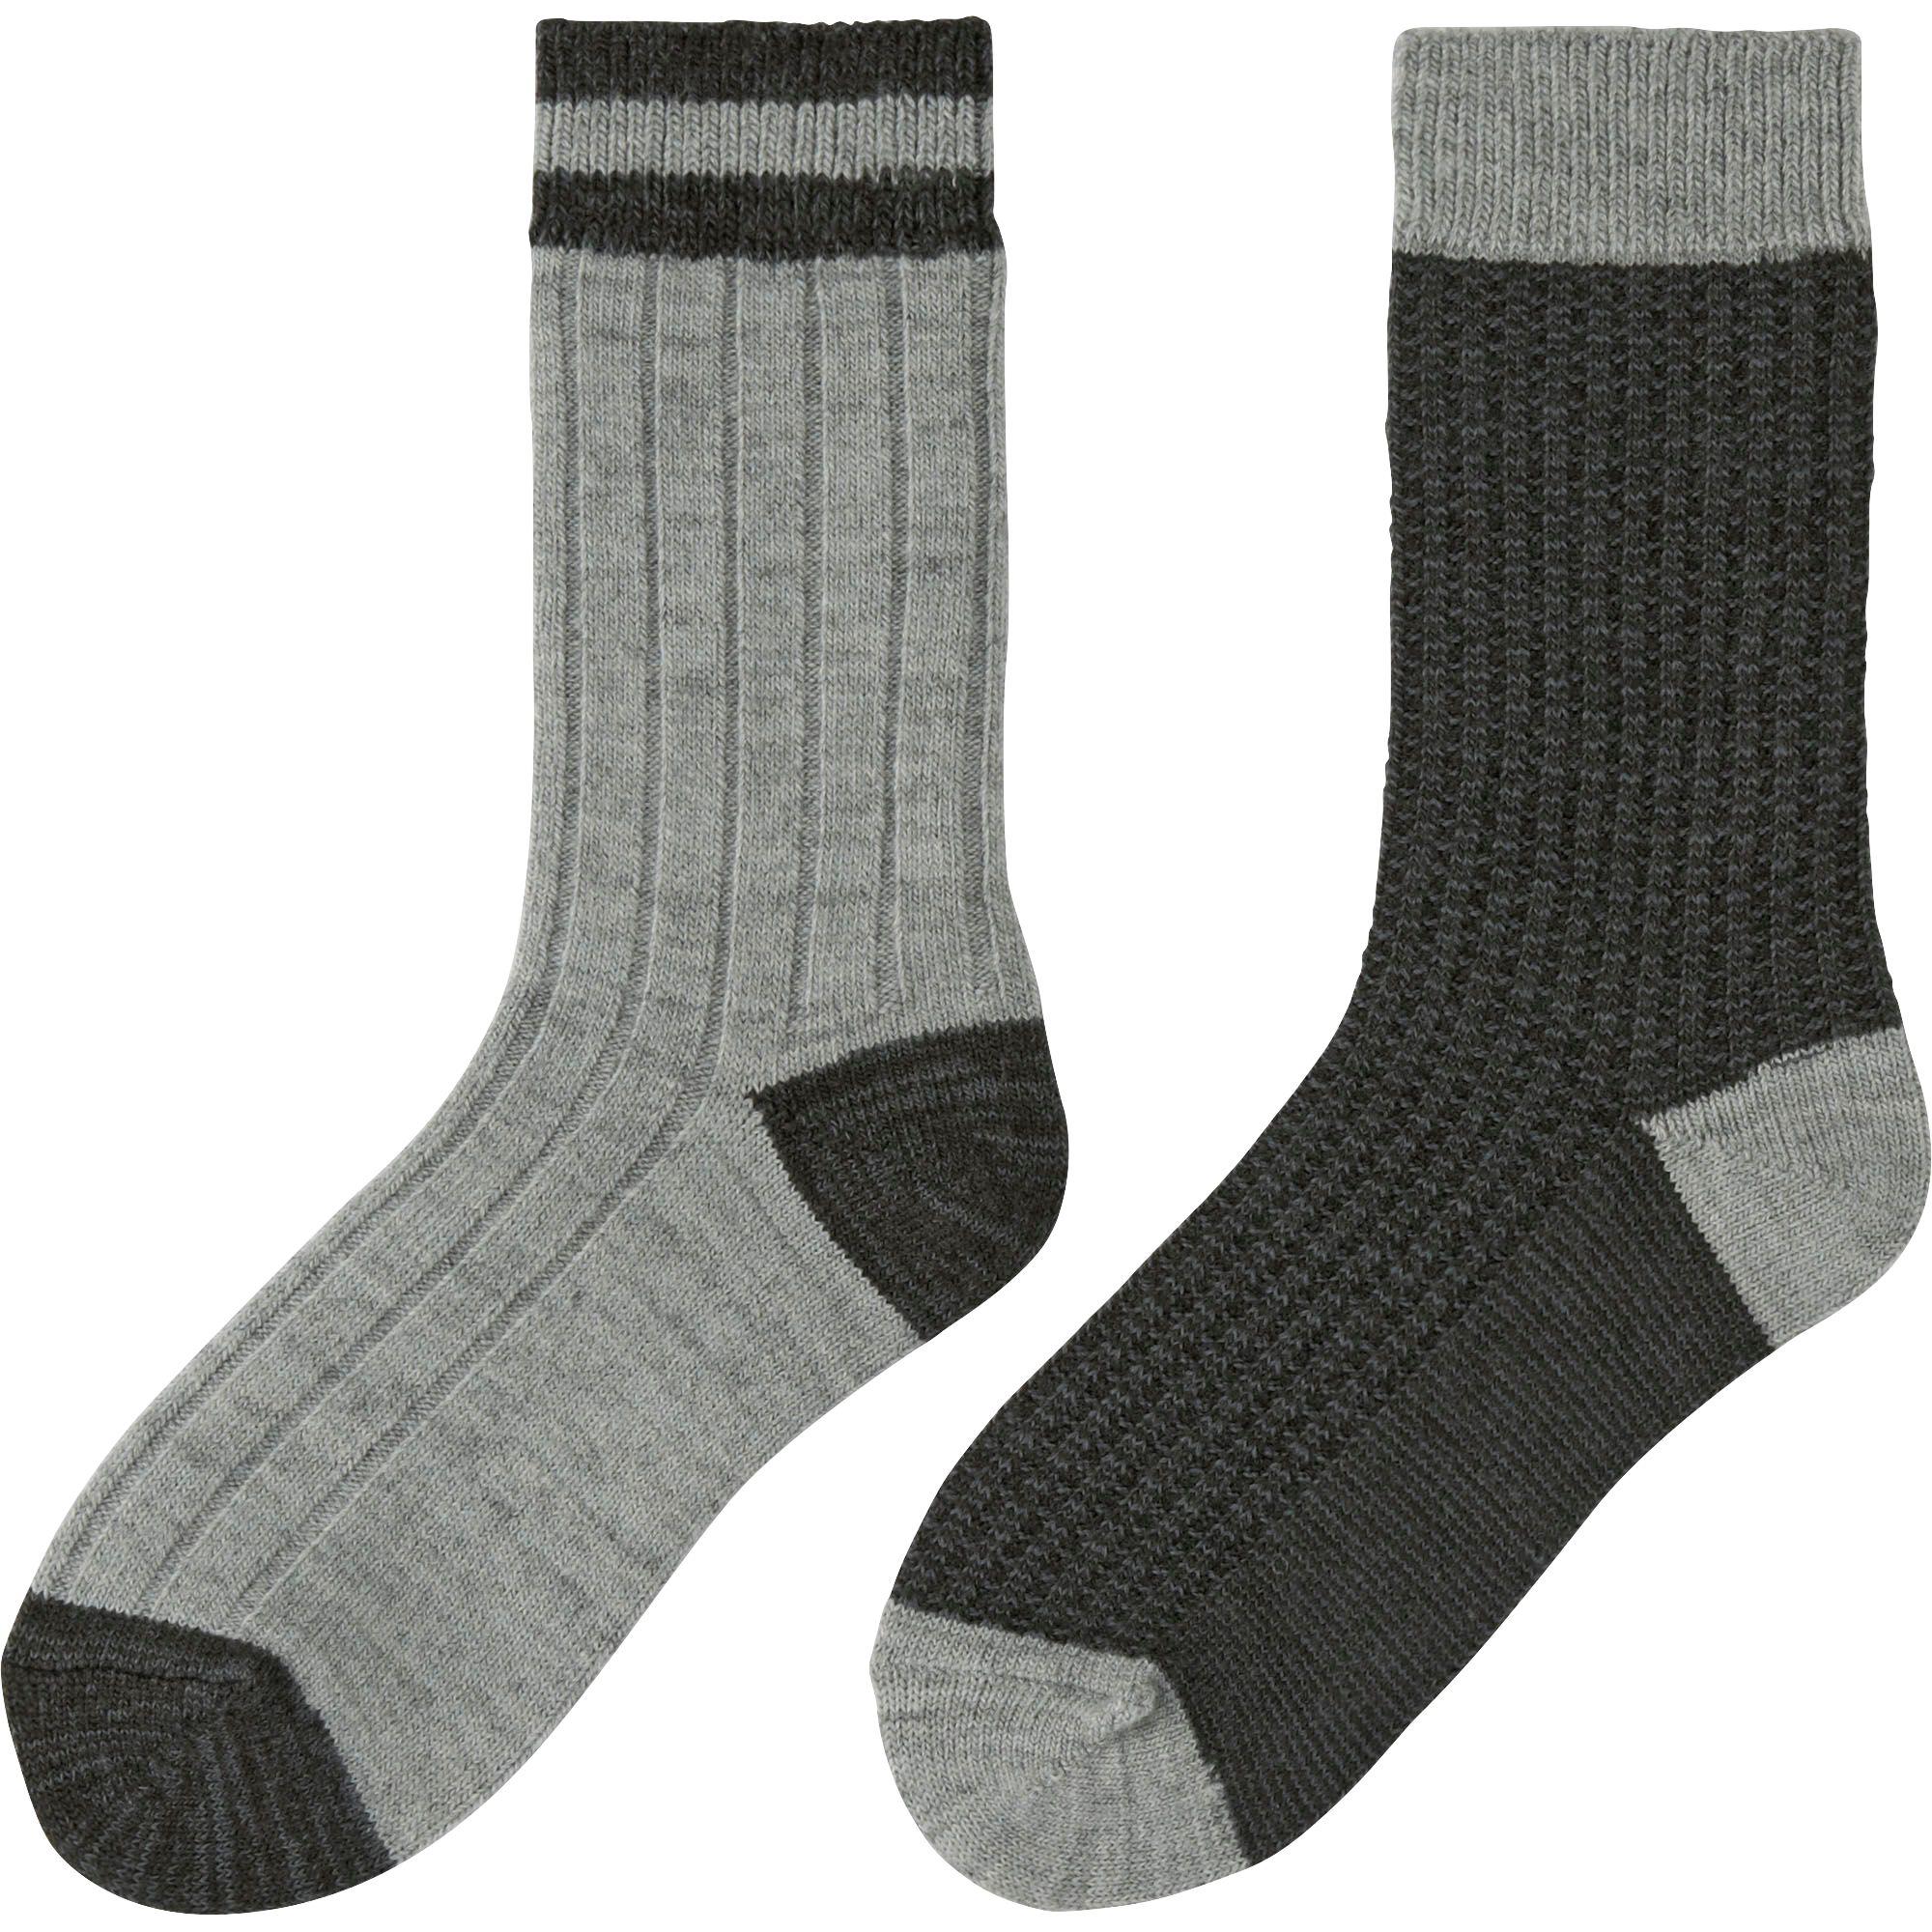 Uniqlo Women Heattech Socks 2 Pairs (rib) In Gray | Lyst